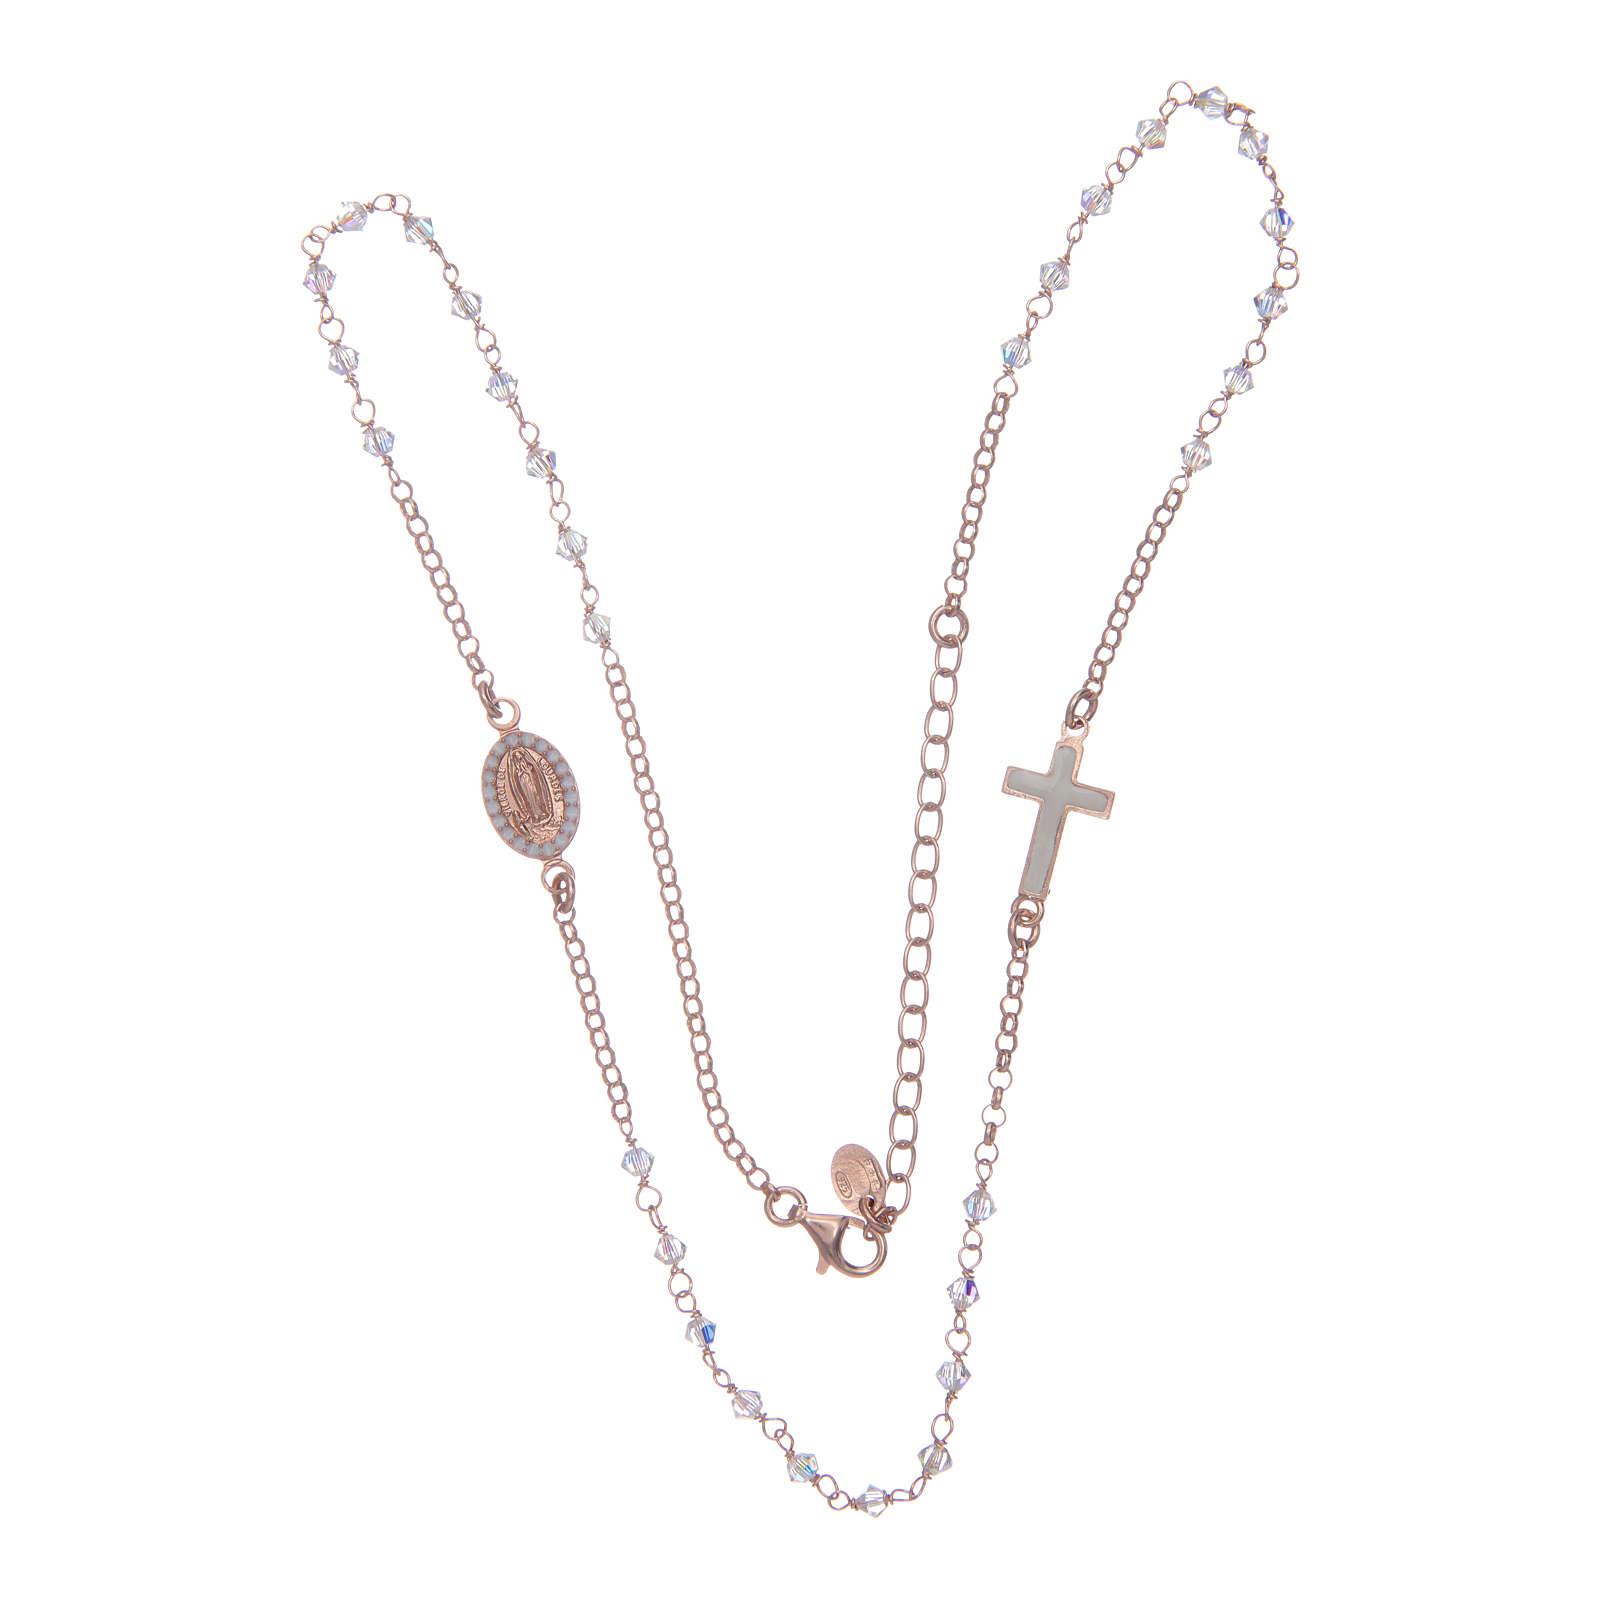 Collar rosario plata 925 rosado con Swarovski transparentes 4